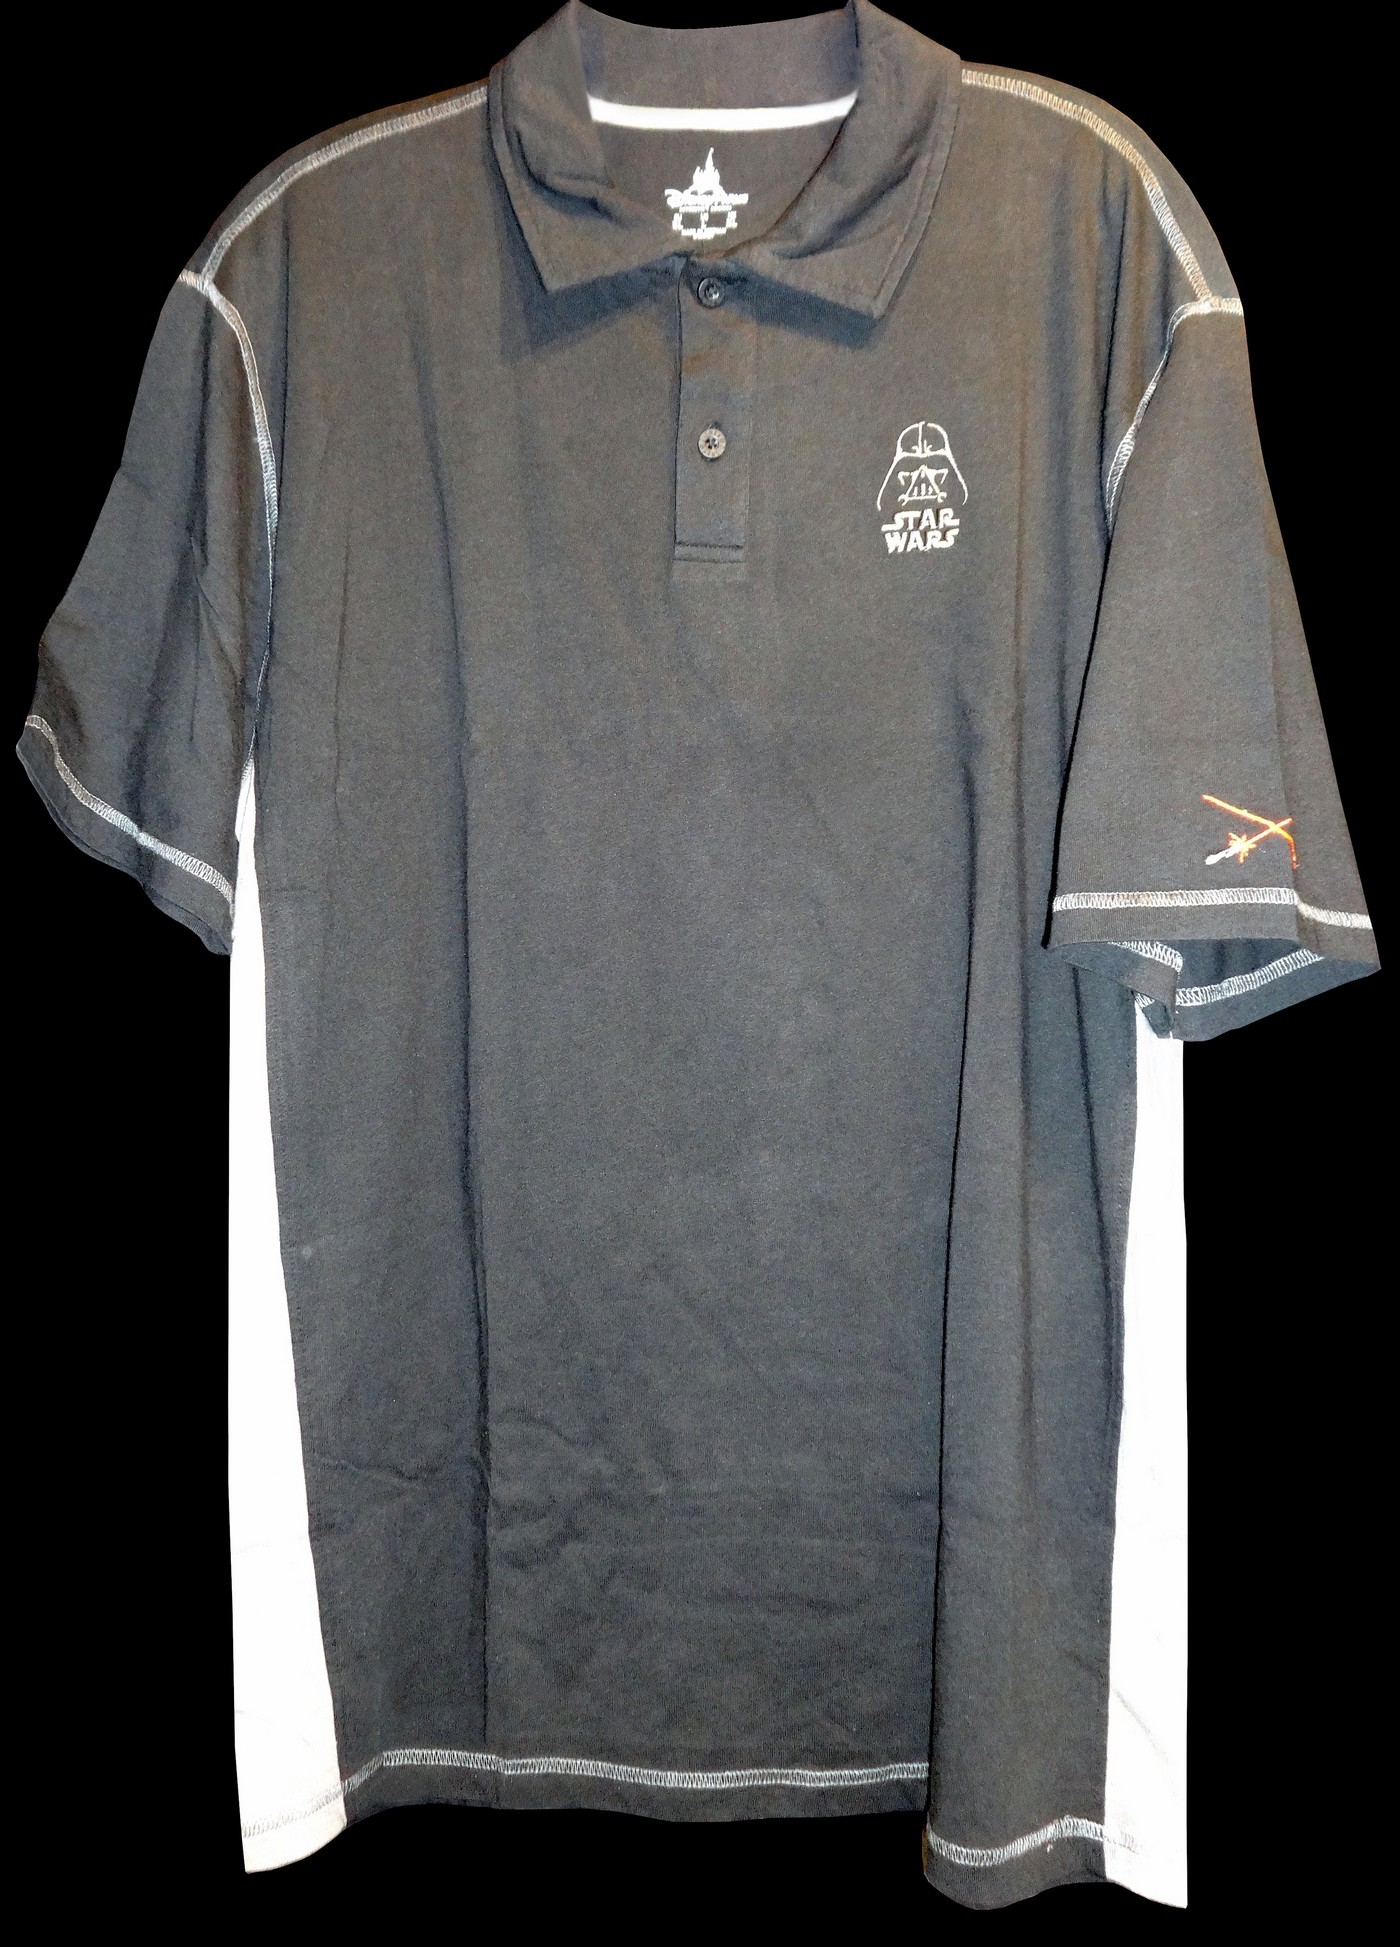 Disney Star Wars Embroidered Cotton Polo Shirt © Dizdude.com